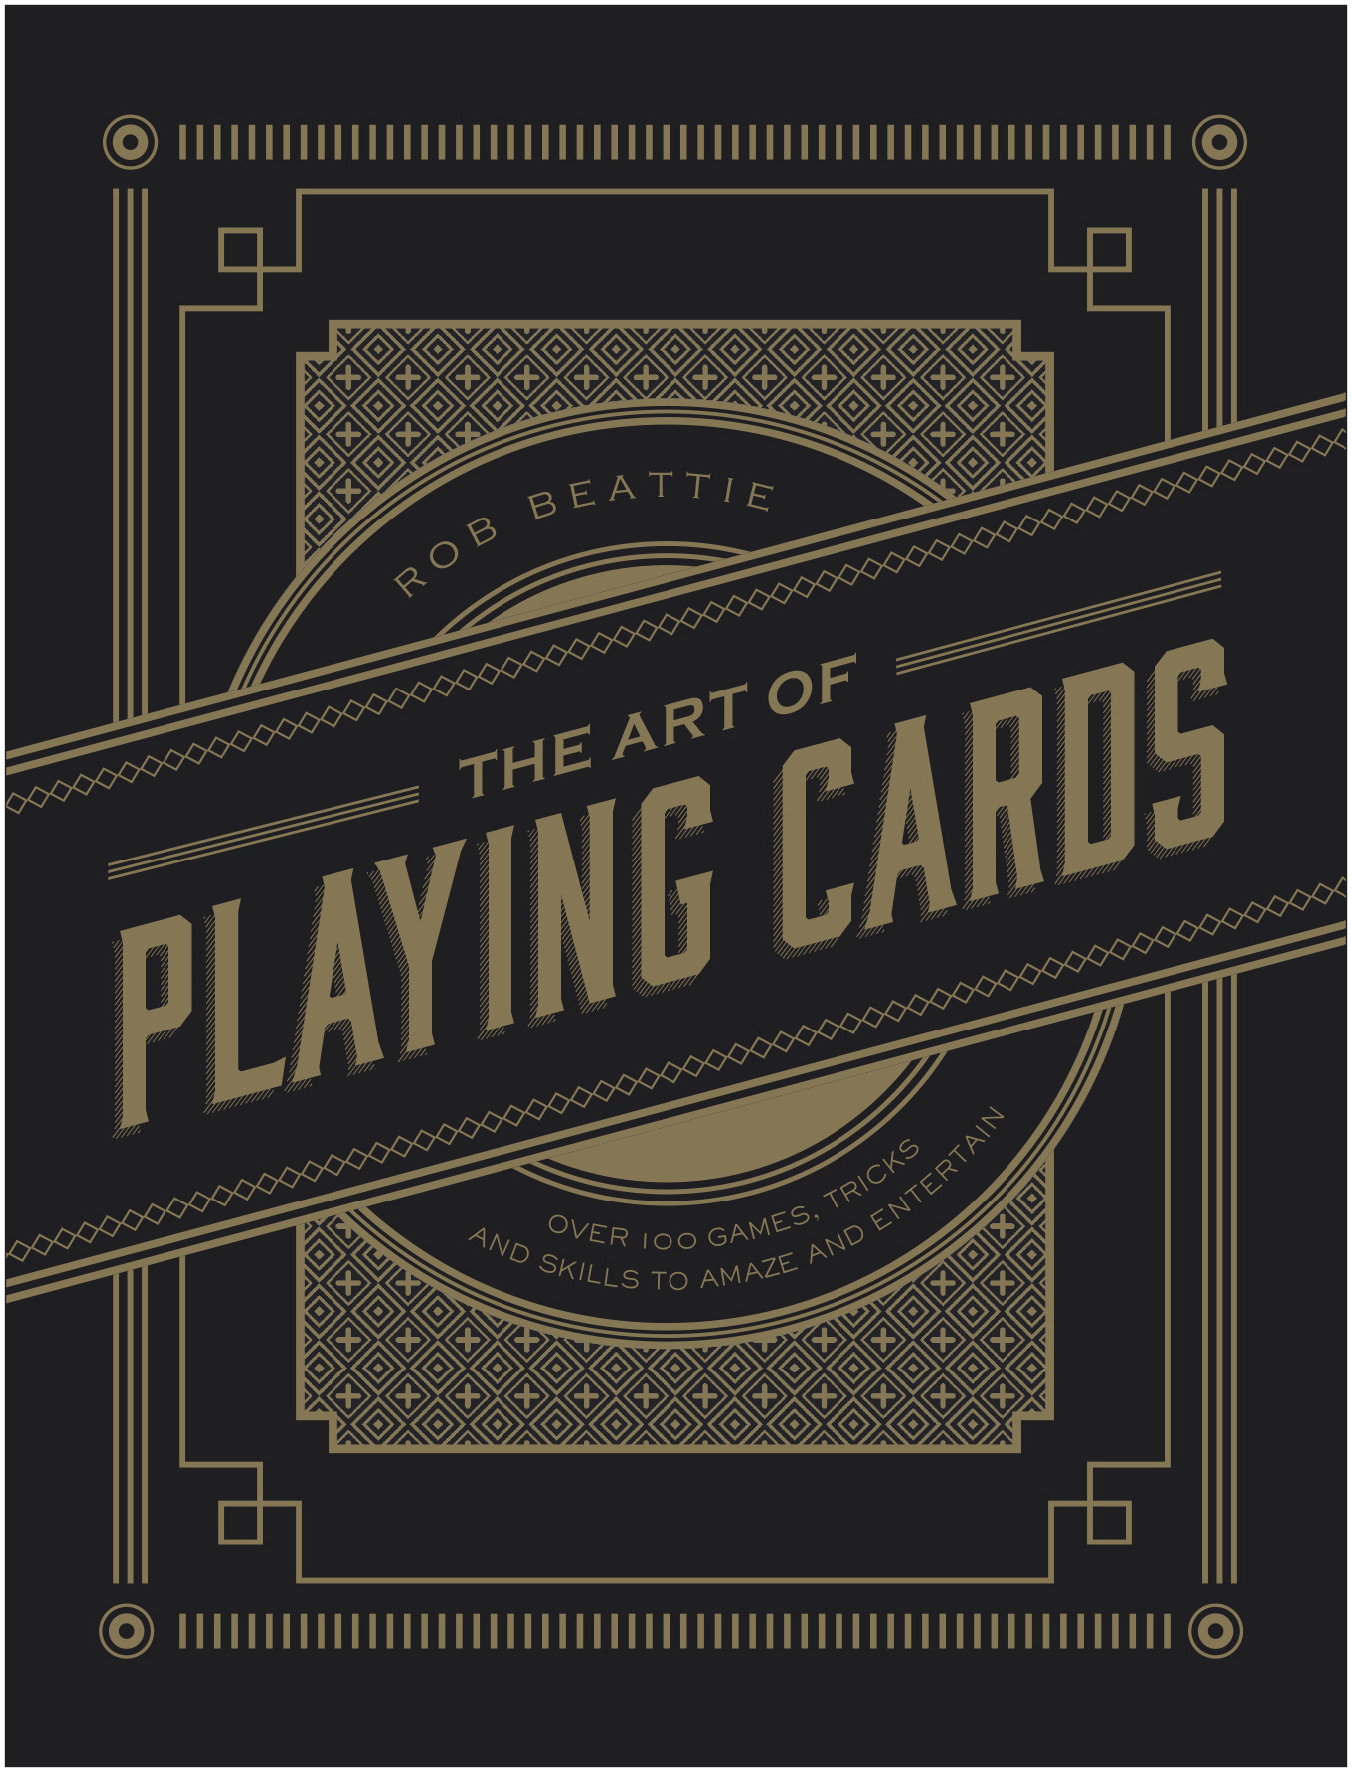 CARDS-1jpg.jpg